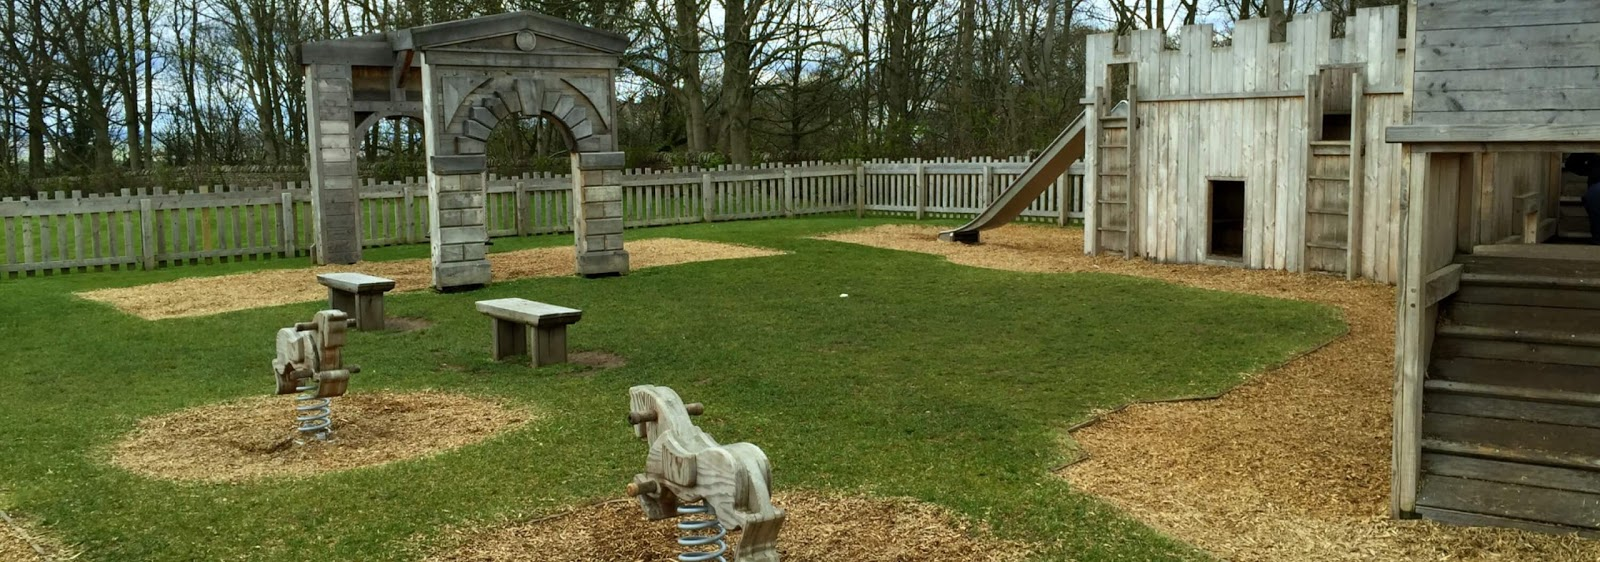 playground-bolsover-castle